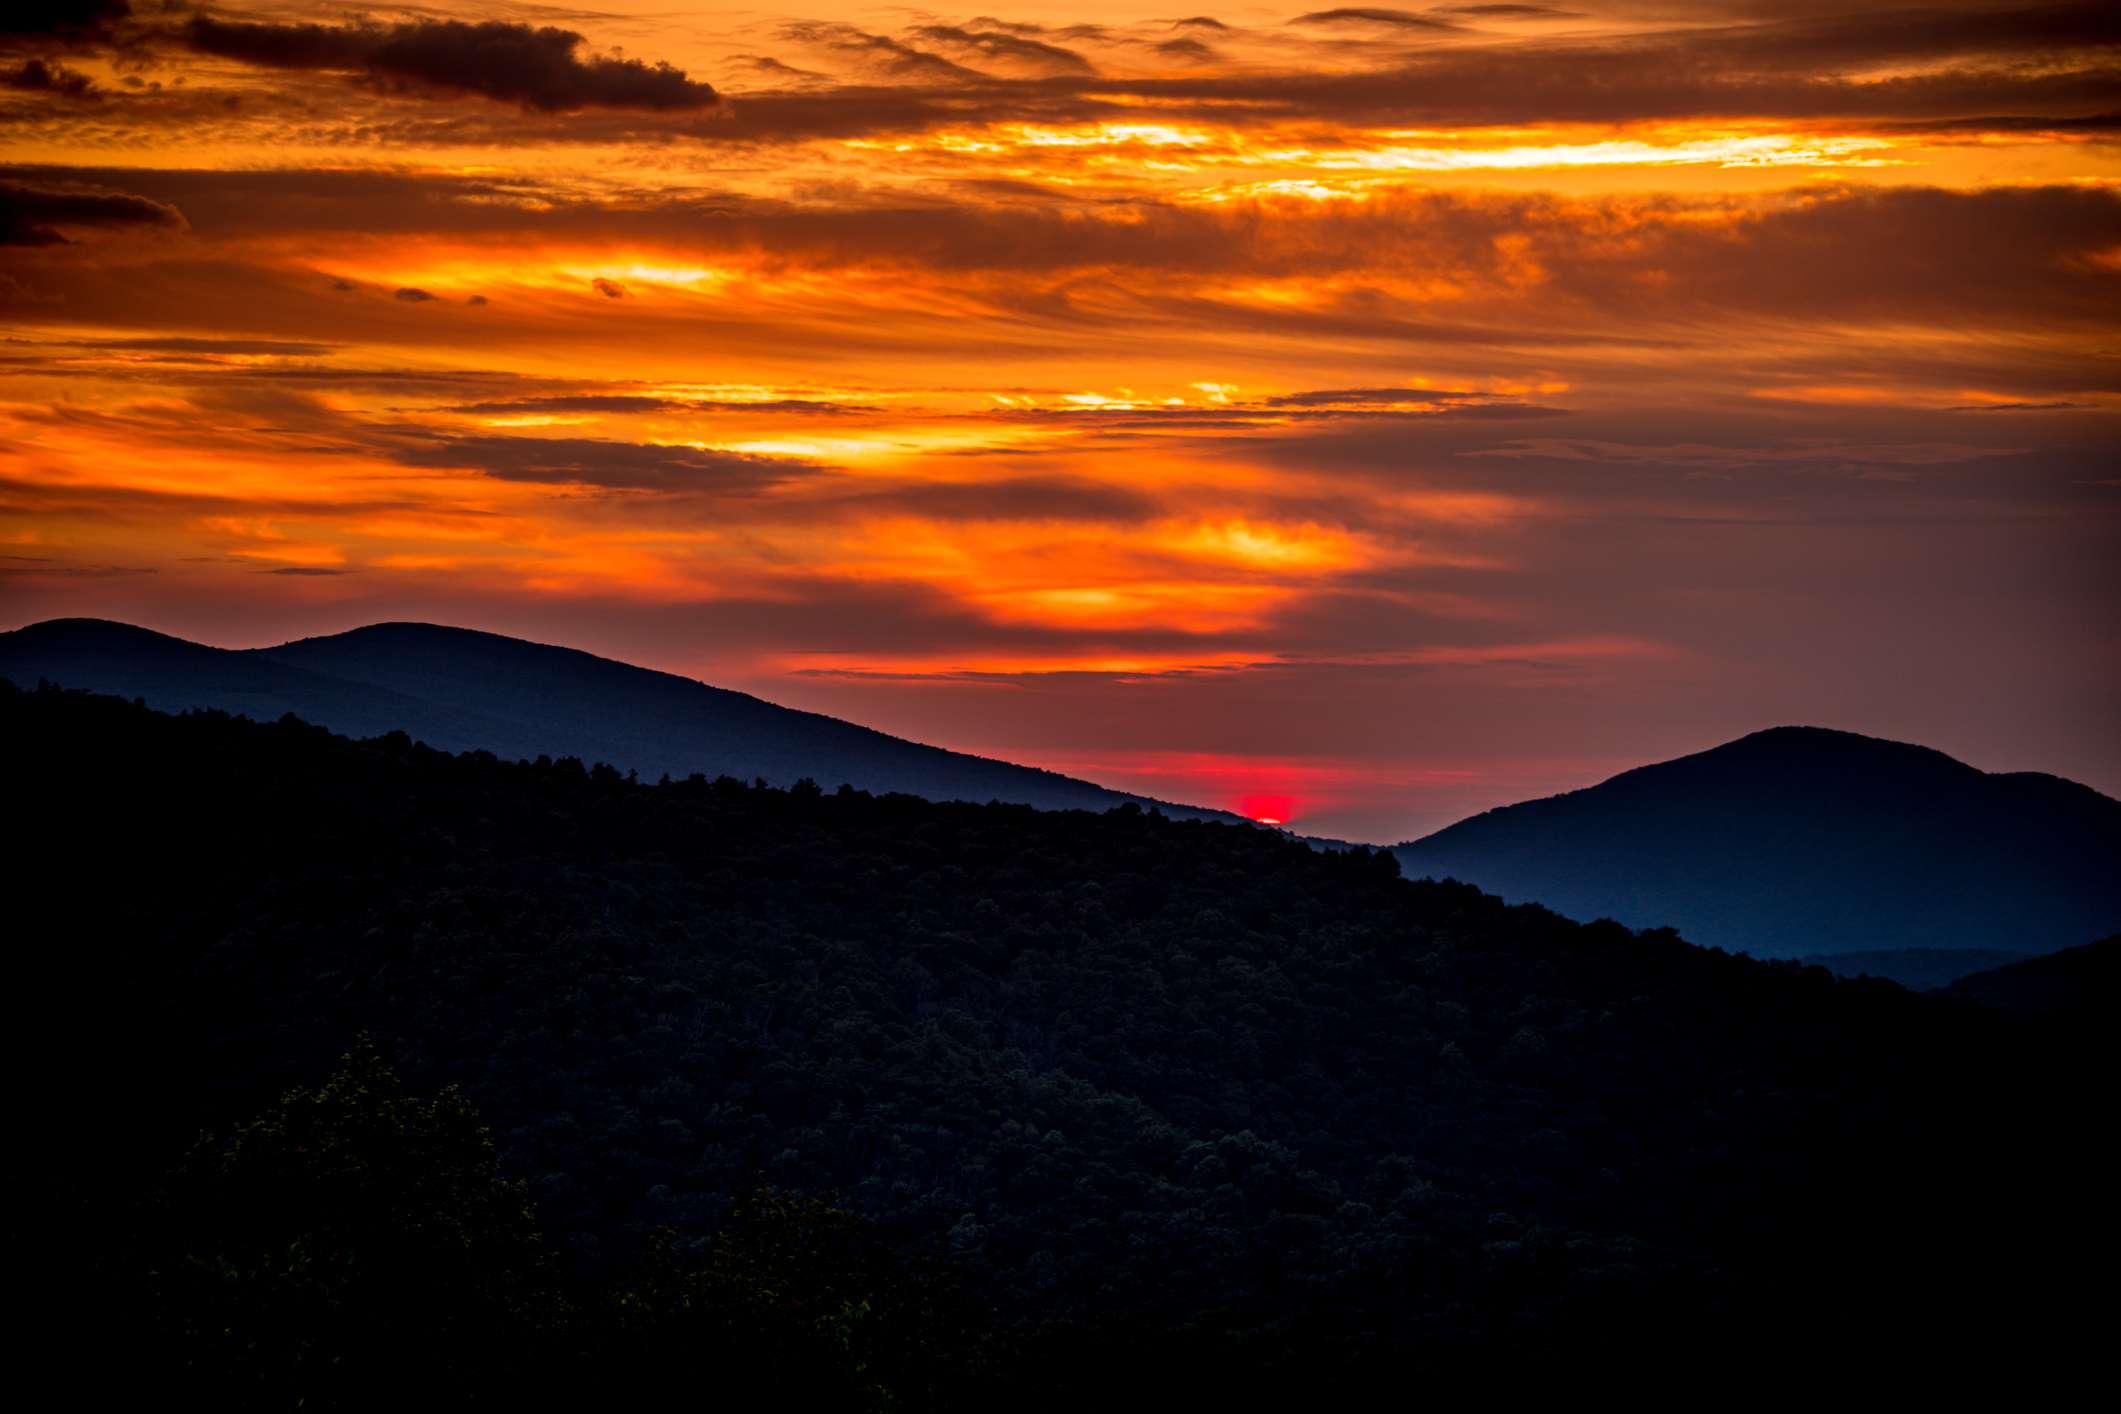 Sunrise over Skyline Drive, Shenandoah National Park